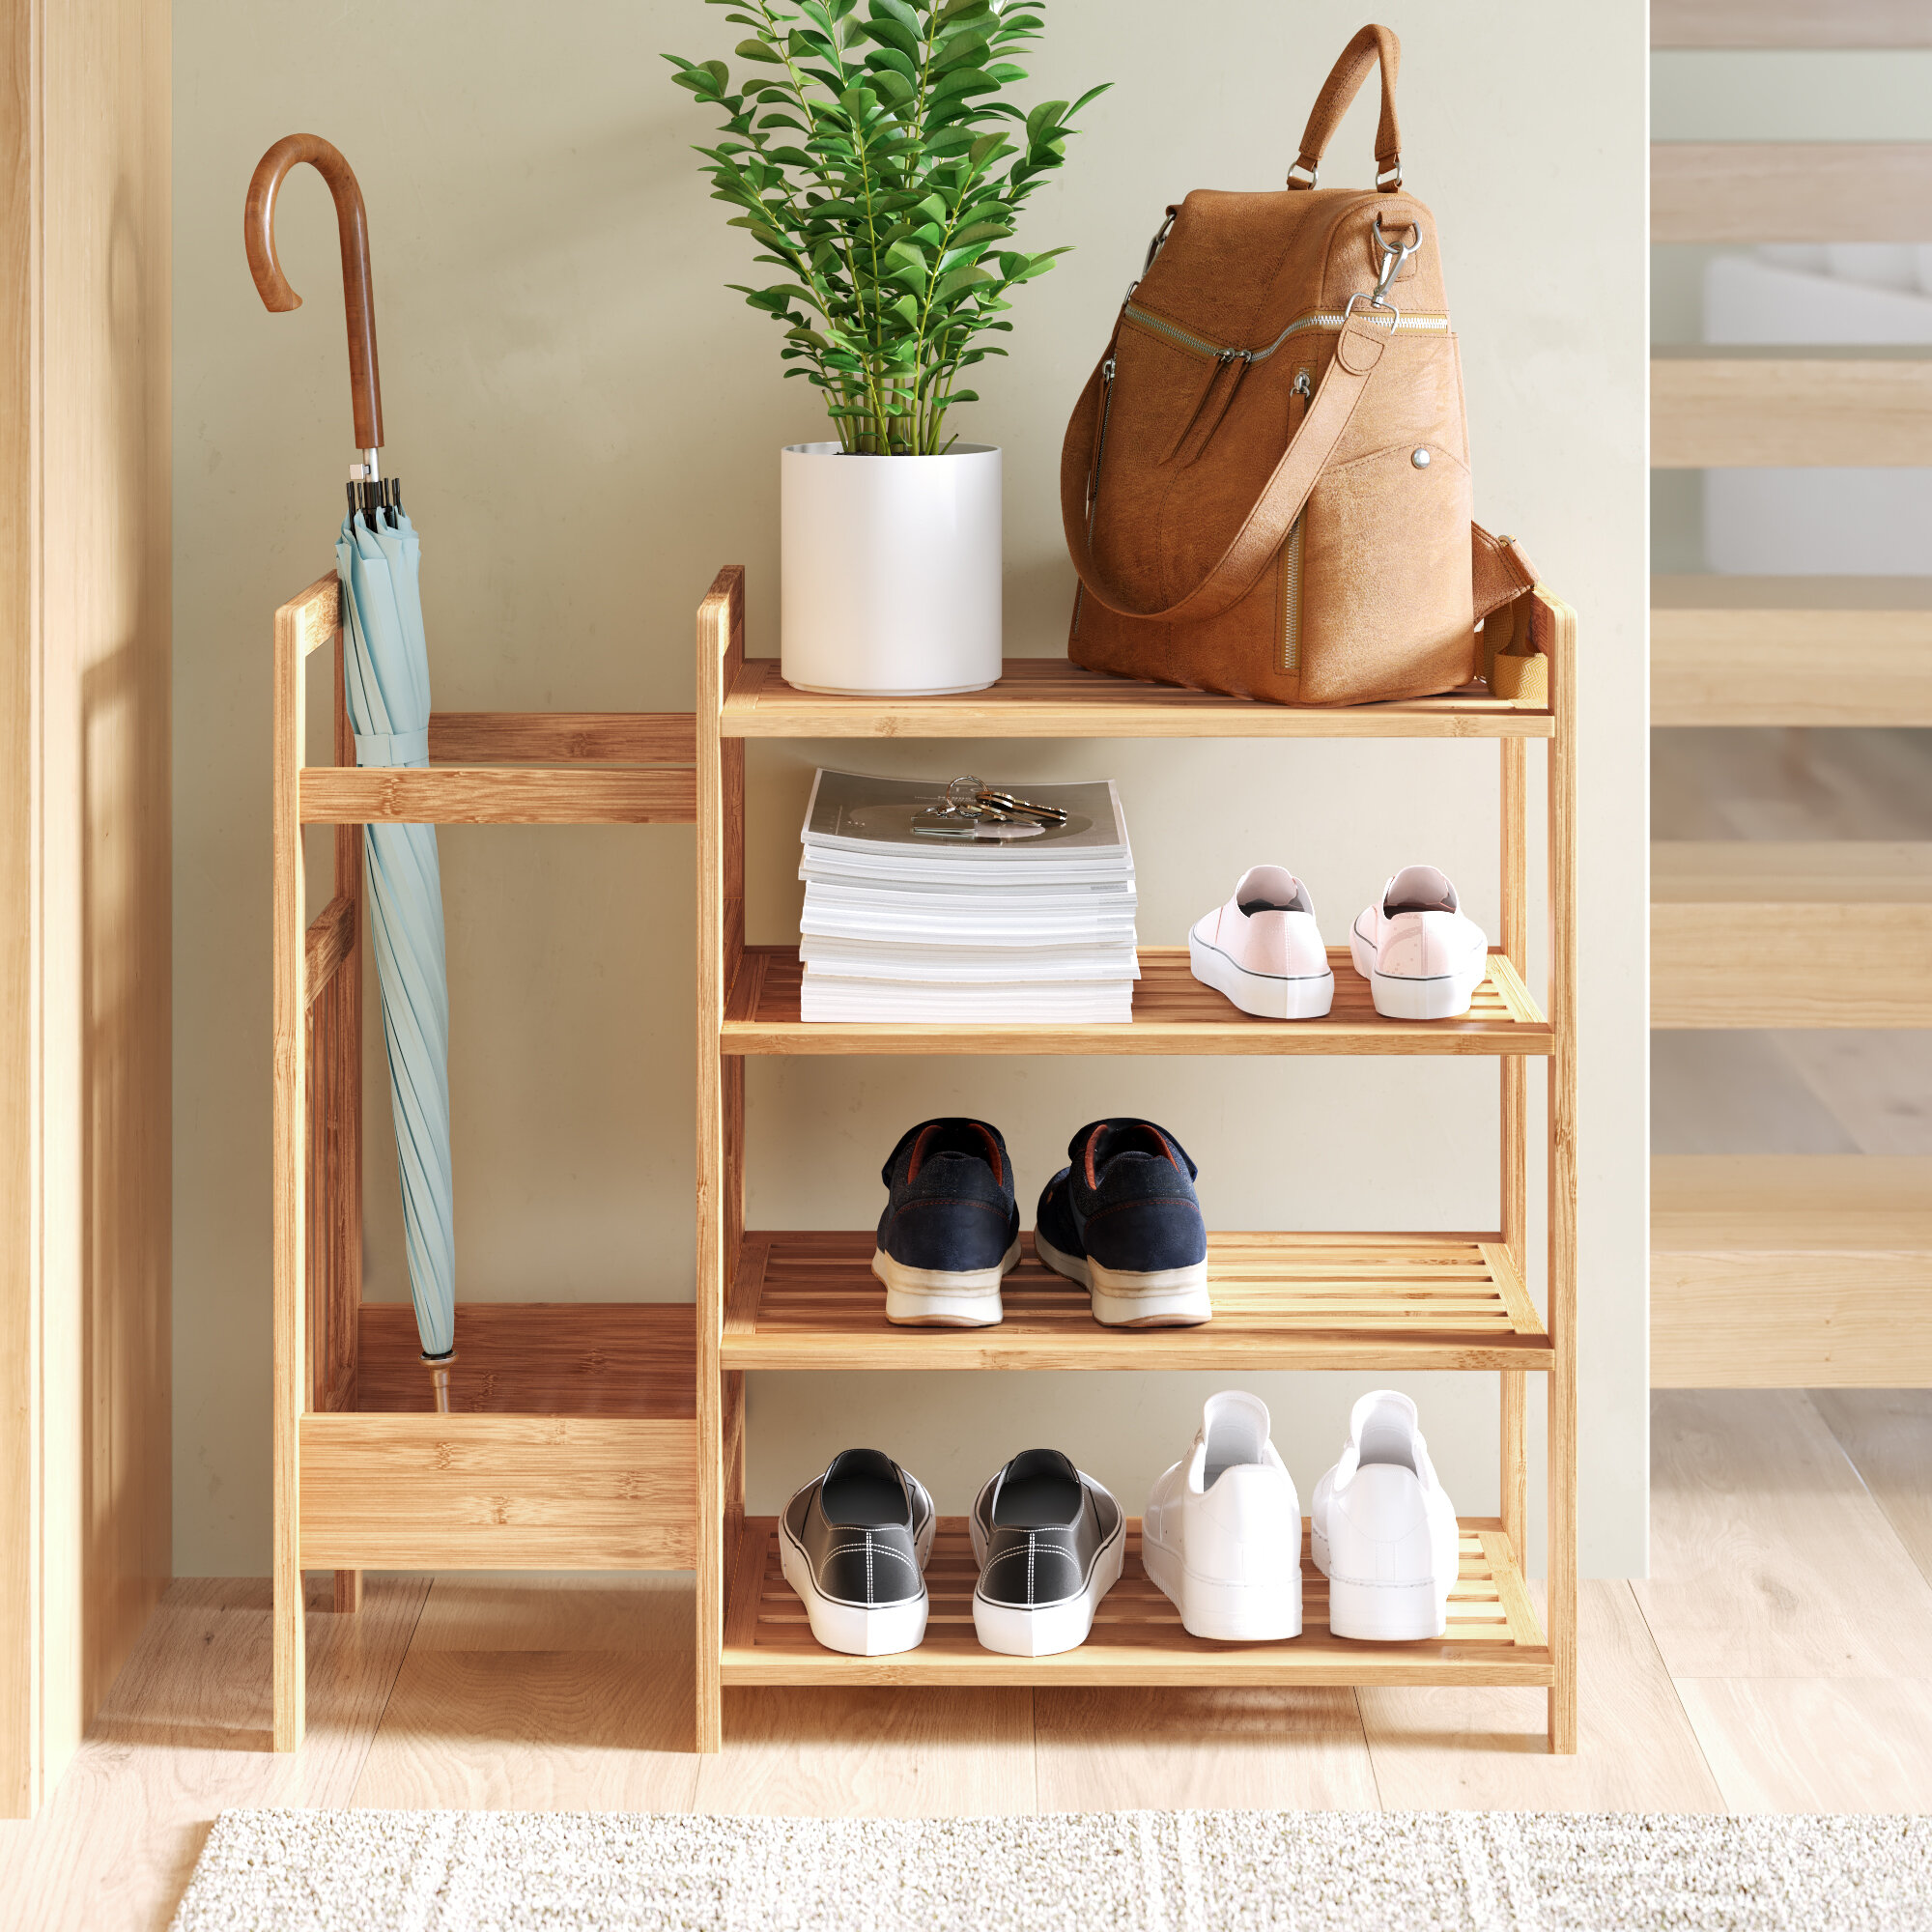 Honey-Can-Do Bamboo Style Tier Shoe Pair Storage Rack Holder Organizer Shelf